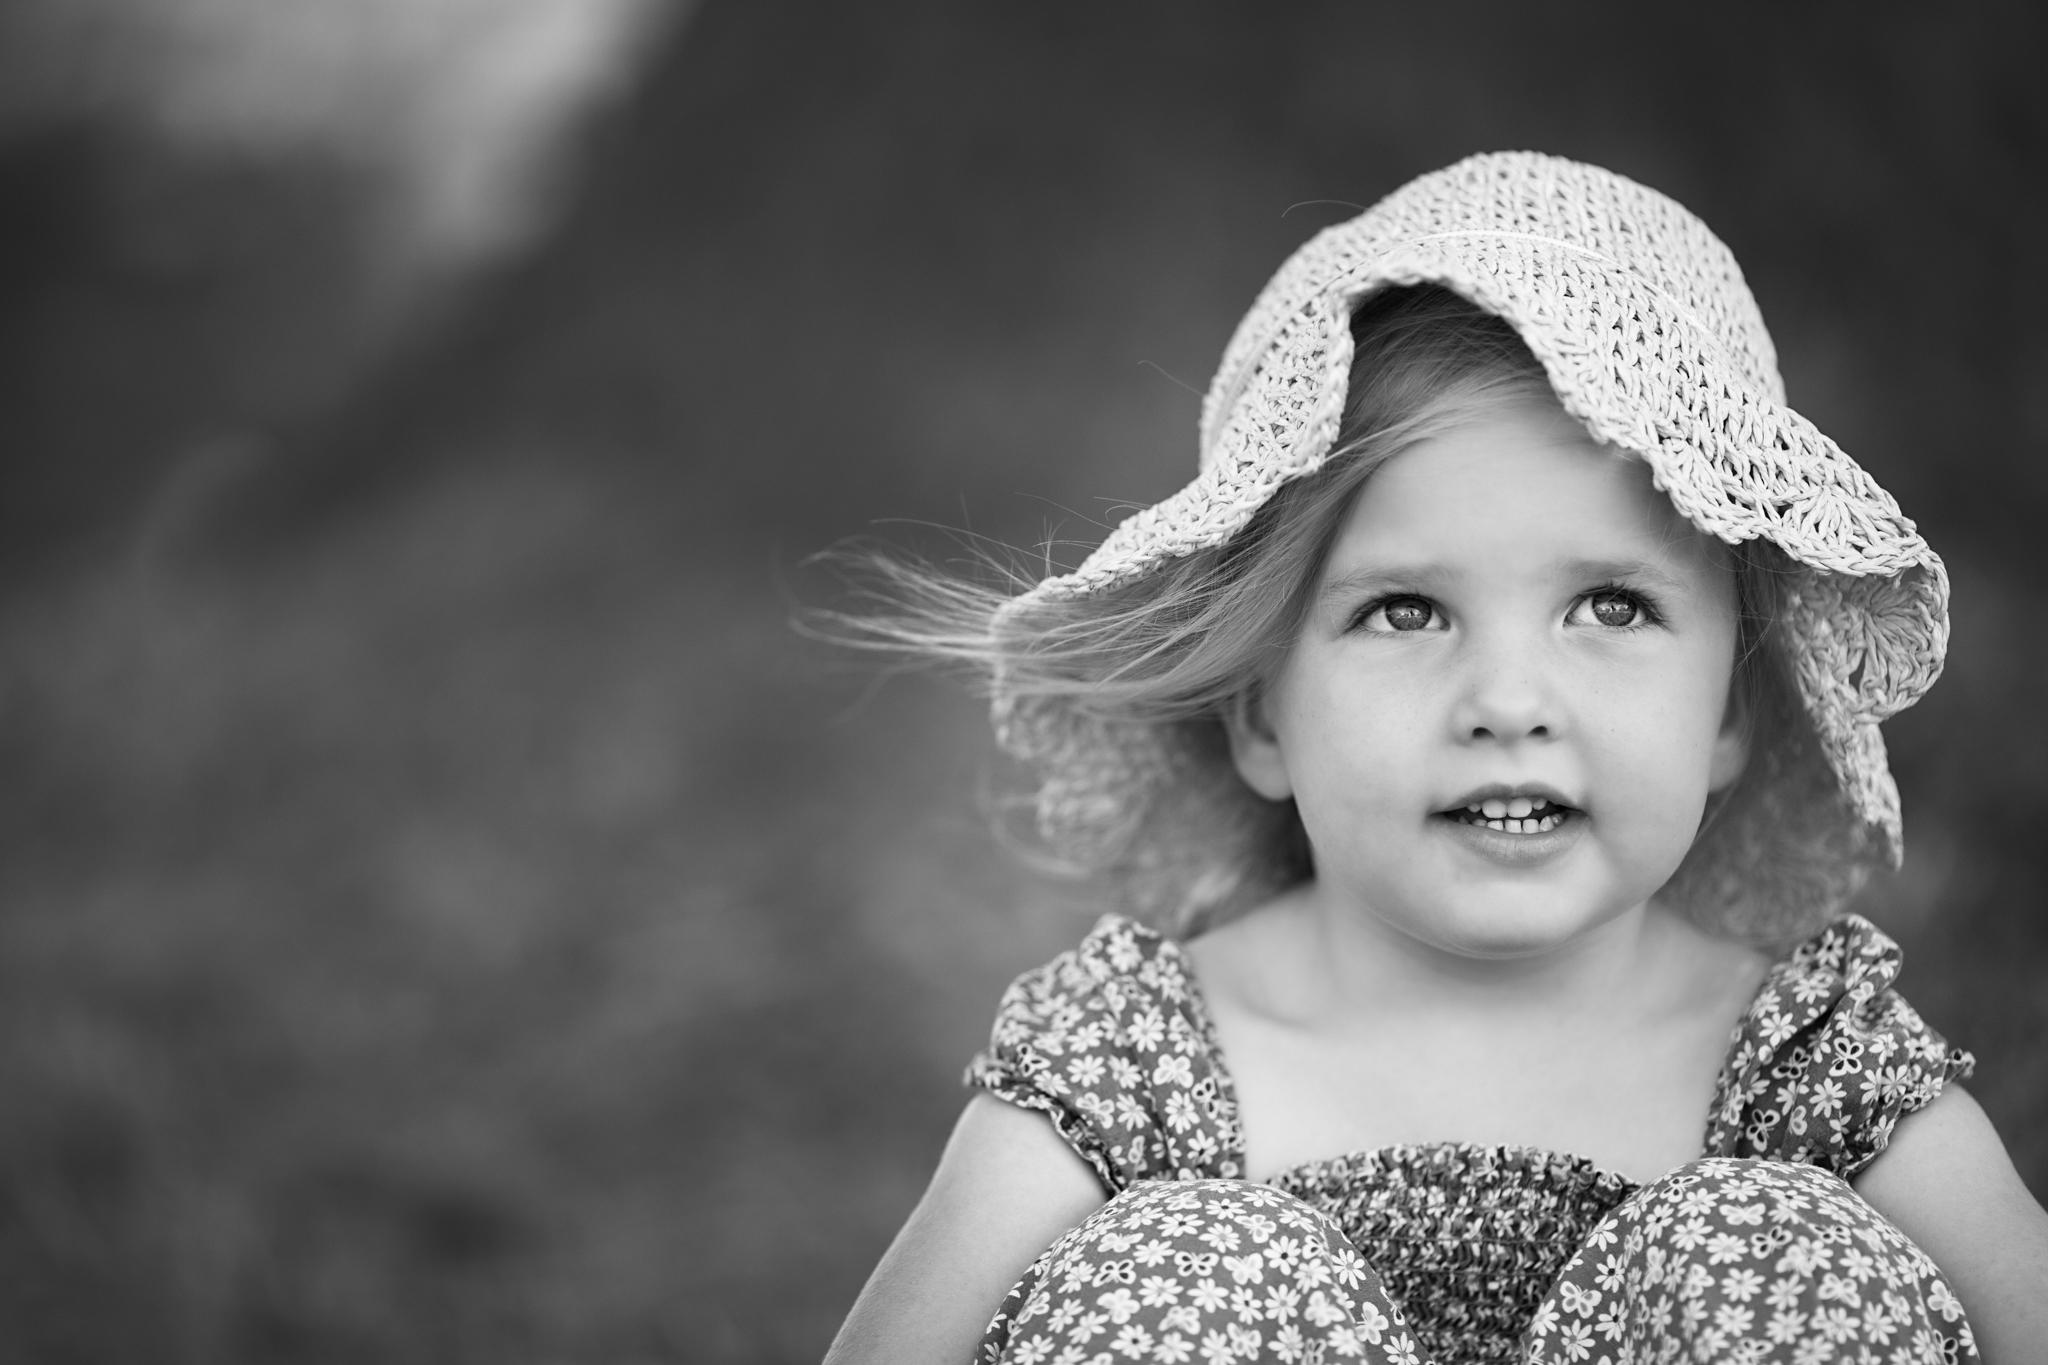 Child Photoshoot - Milton Keynes Child Photographer.jpg